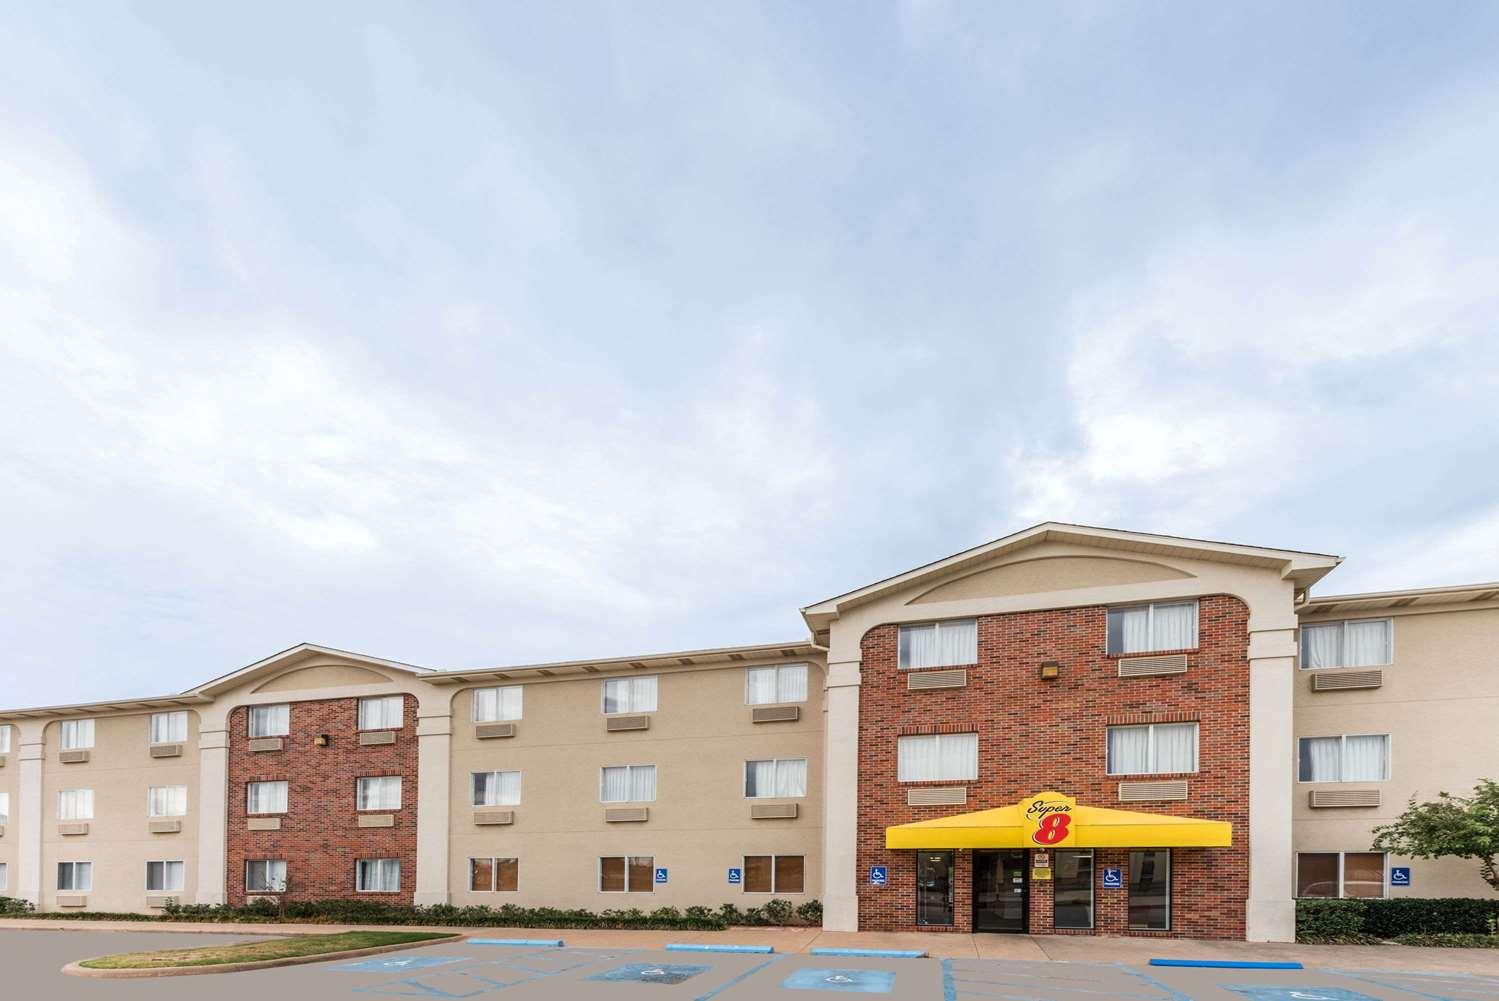 Super 8 Hotel Wichita Falls, TX - See Discounts